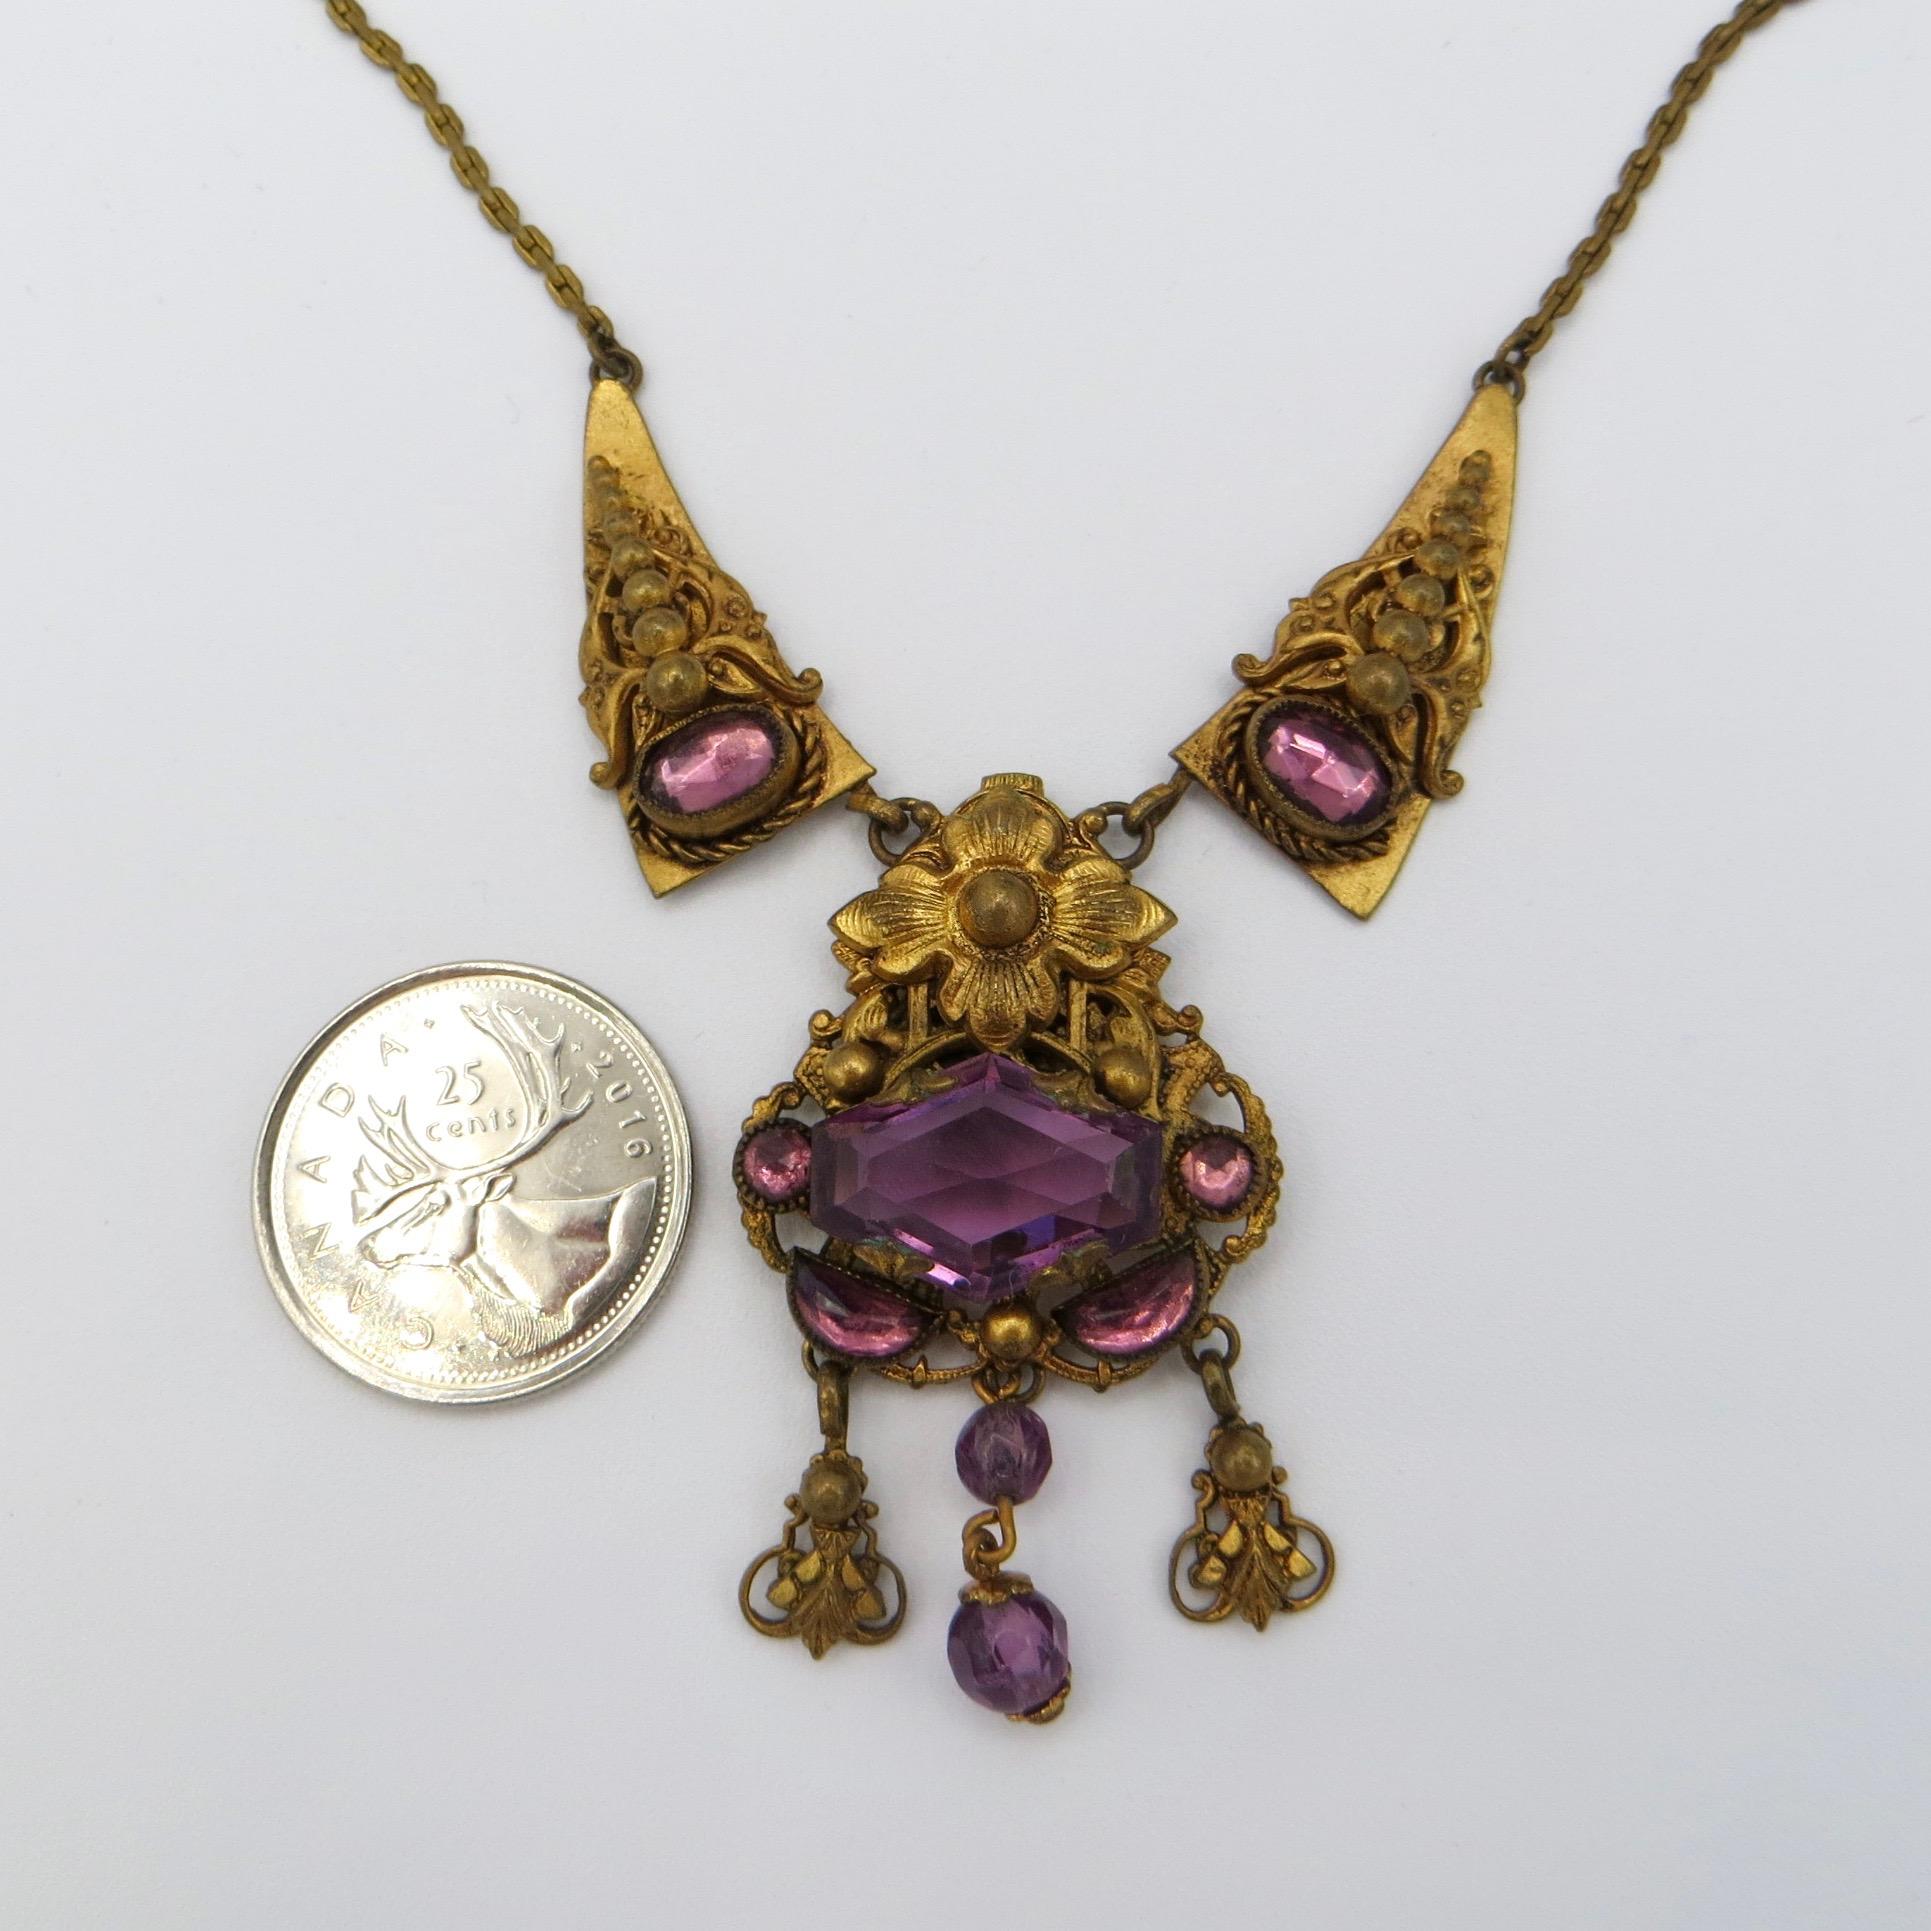 Victorian Floral Motif Necklace